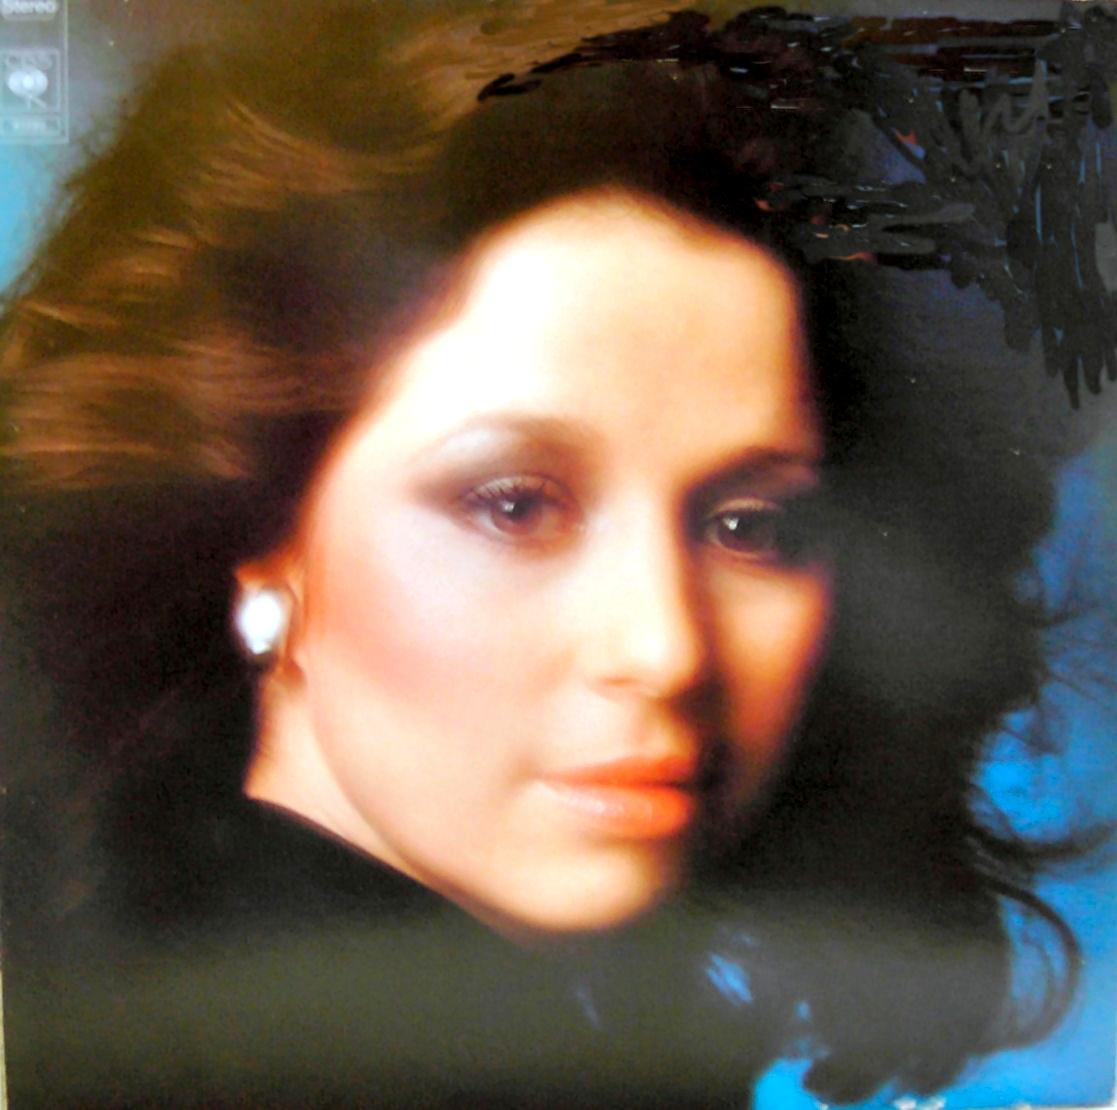 Tina Charles - Arquivos / Files